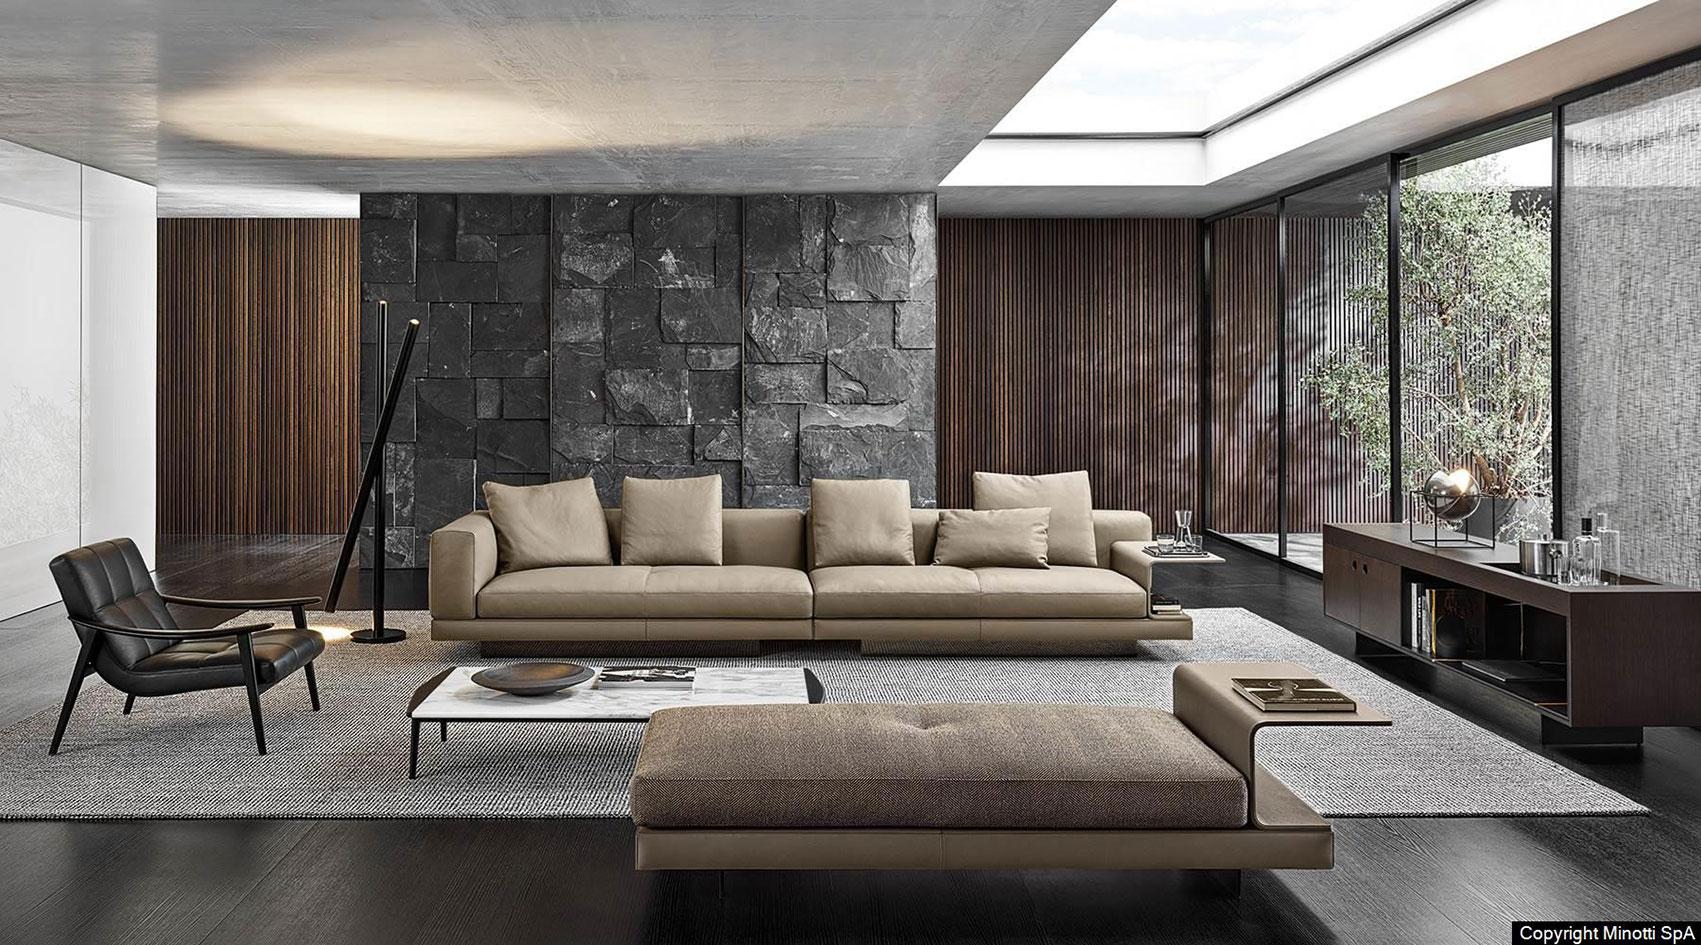 connery-sofa-minotti